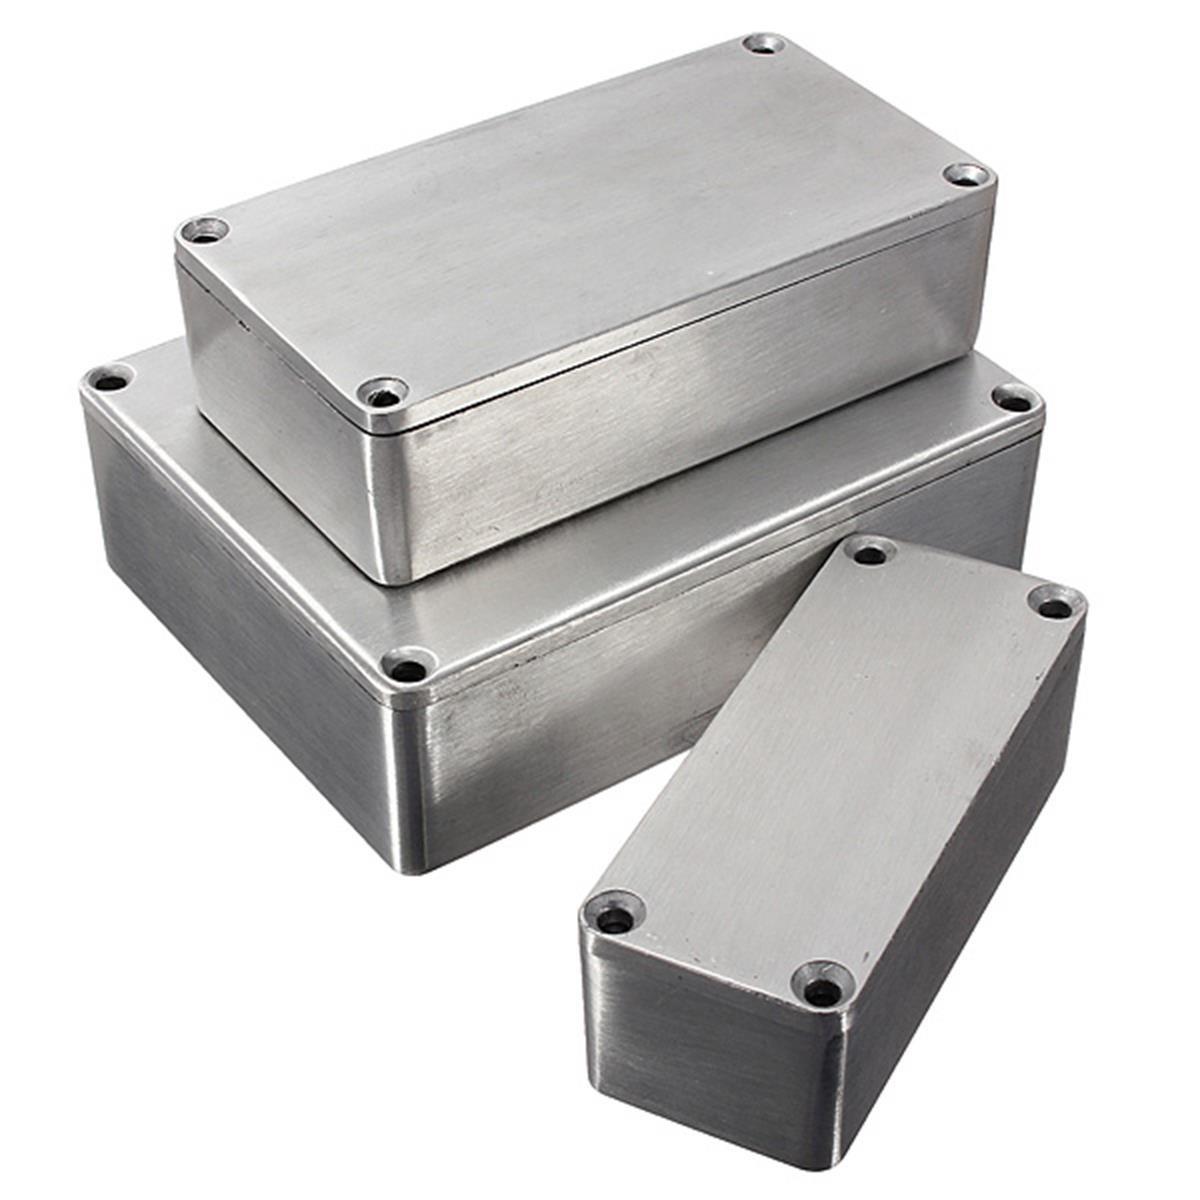 1590BB Style 120X95X35mm Aluminum Stomp Box Effects Pedal Enclosure Guitar